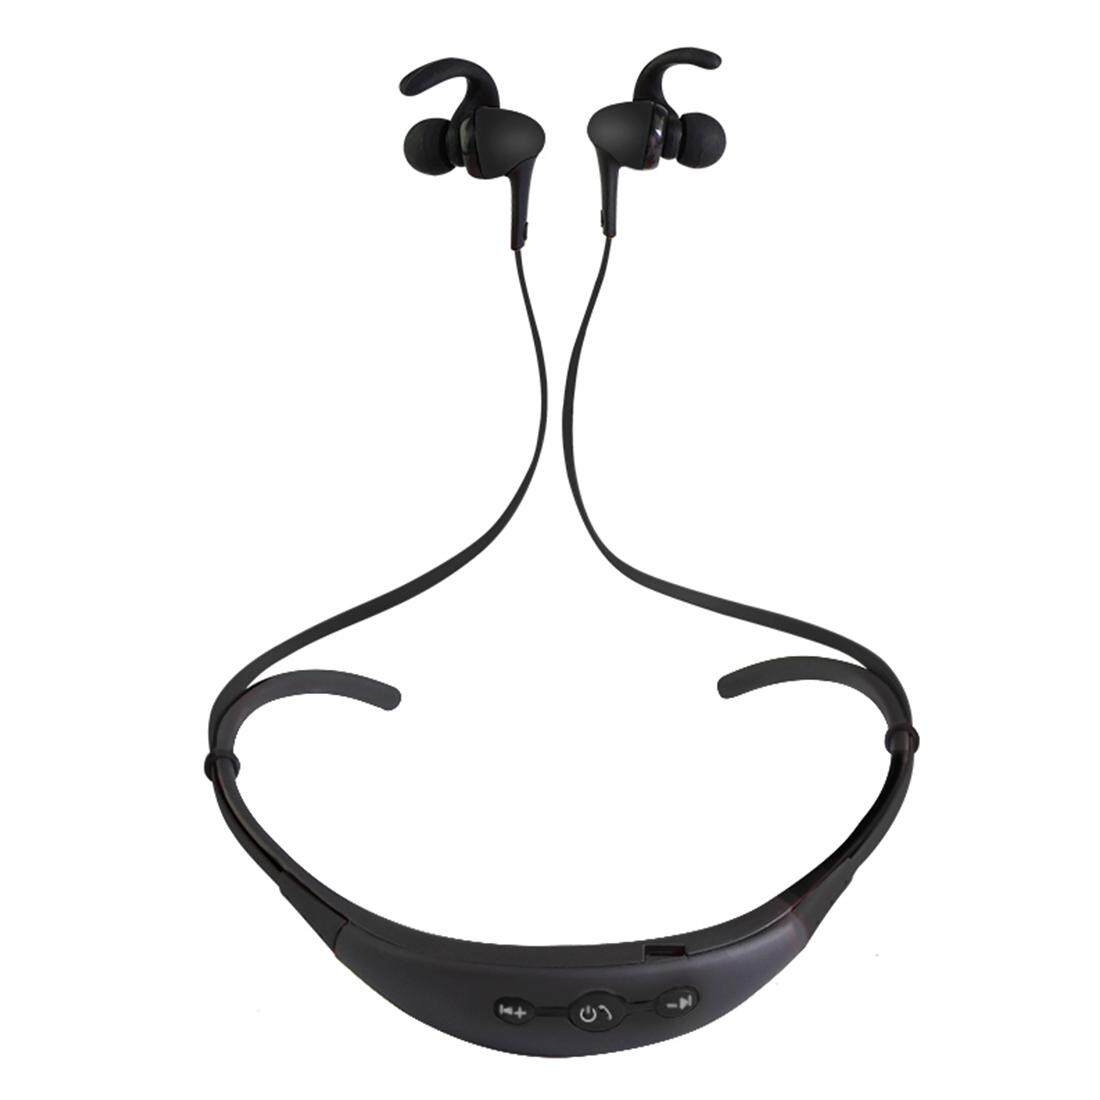 BT-54 หูฟังลวด Control วงดนตรีกีฬาไร้สายหูฟังบลูทูธพร้อมไมโครโฟนหู Hook, สนับสนุนการปล่อยมือ Call, สำหรับ iPad, iPhone, GALAXY, Huawei, Xiaomi, LG, HTC และโทรศัพท์สมาร์ทอื่นๆ (สีดำ)